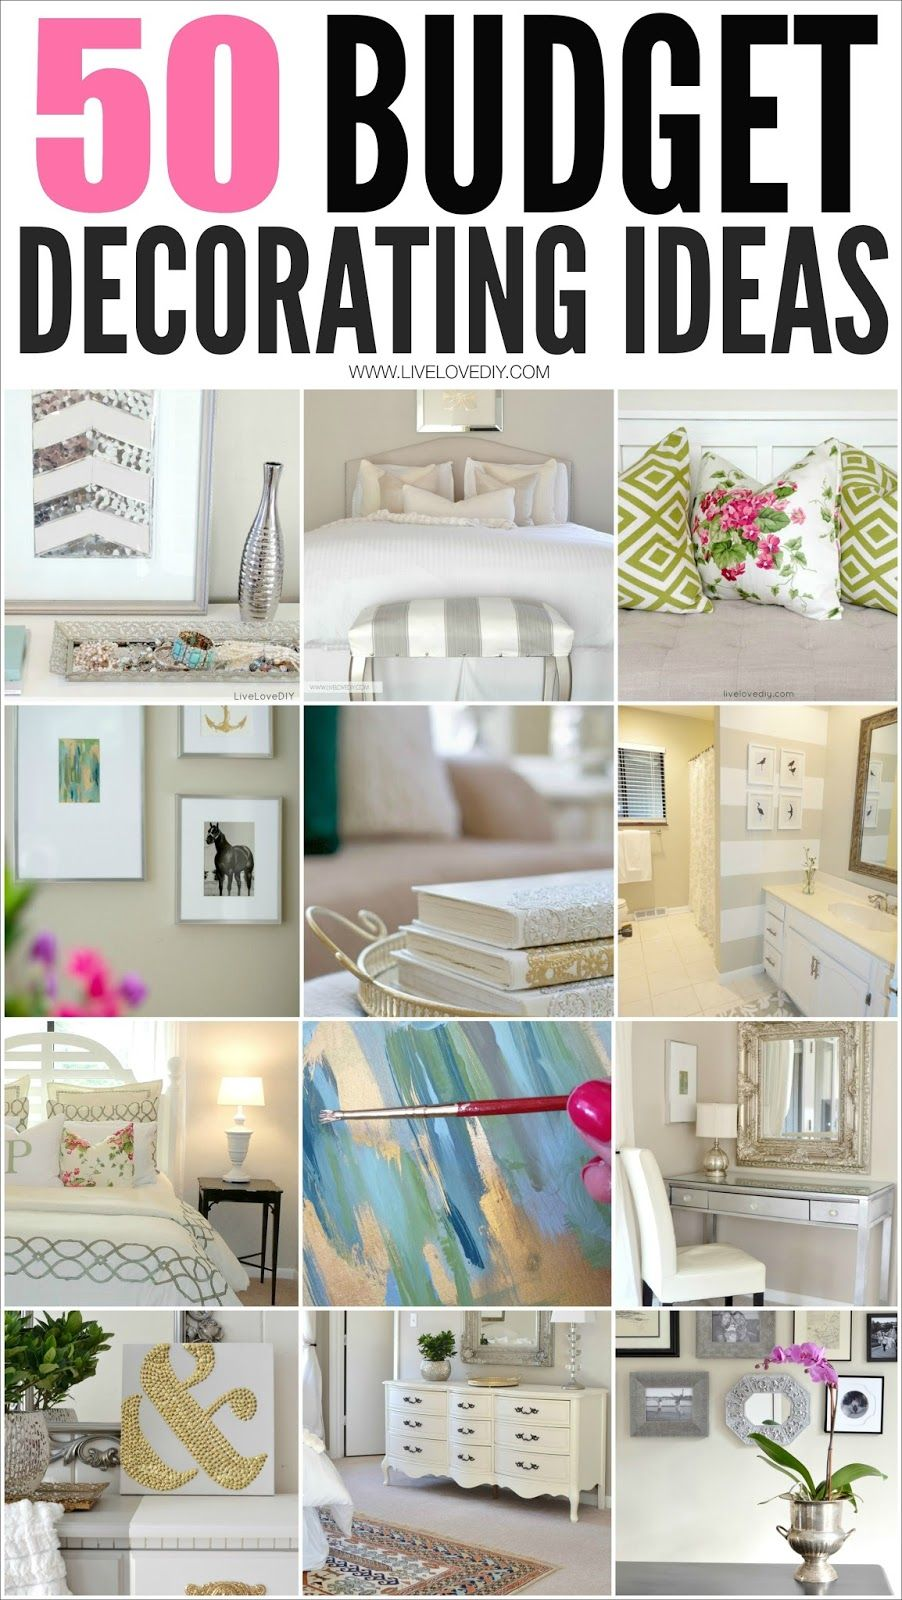 Cheap Home Decorating Ideas Budget